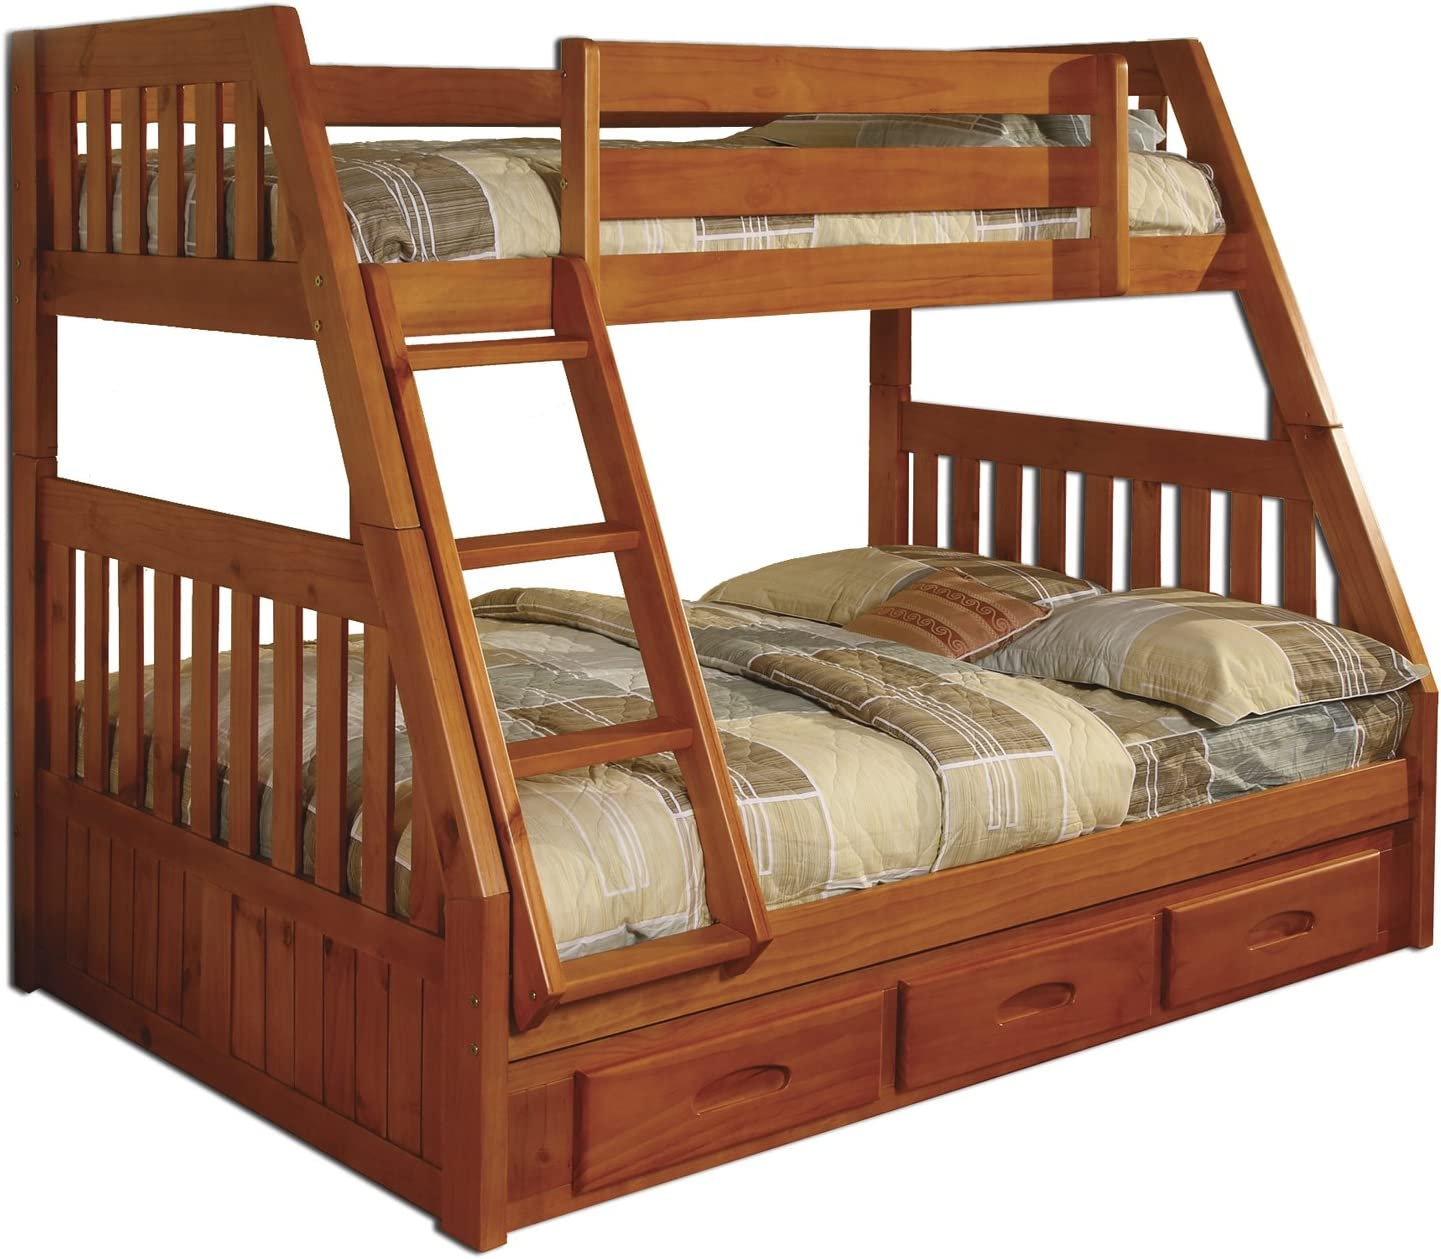 American Furniture Classics Bunk Bed, Twin/Full